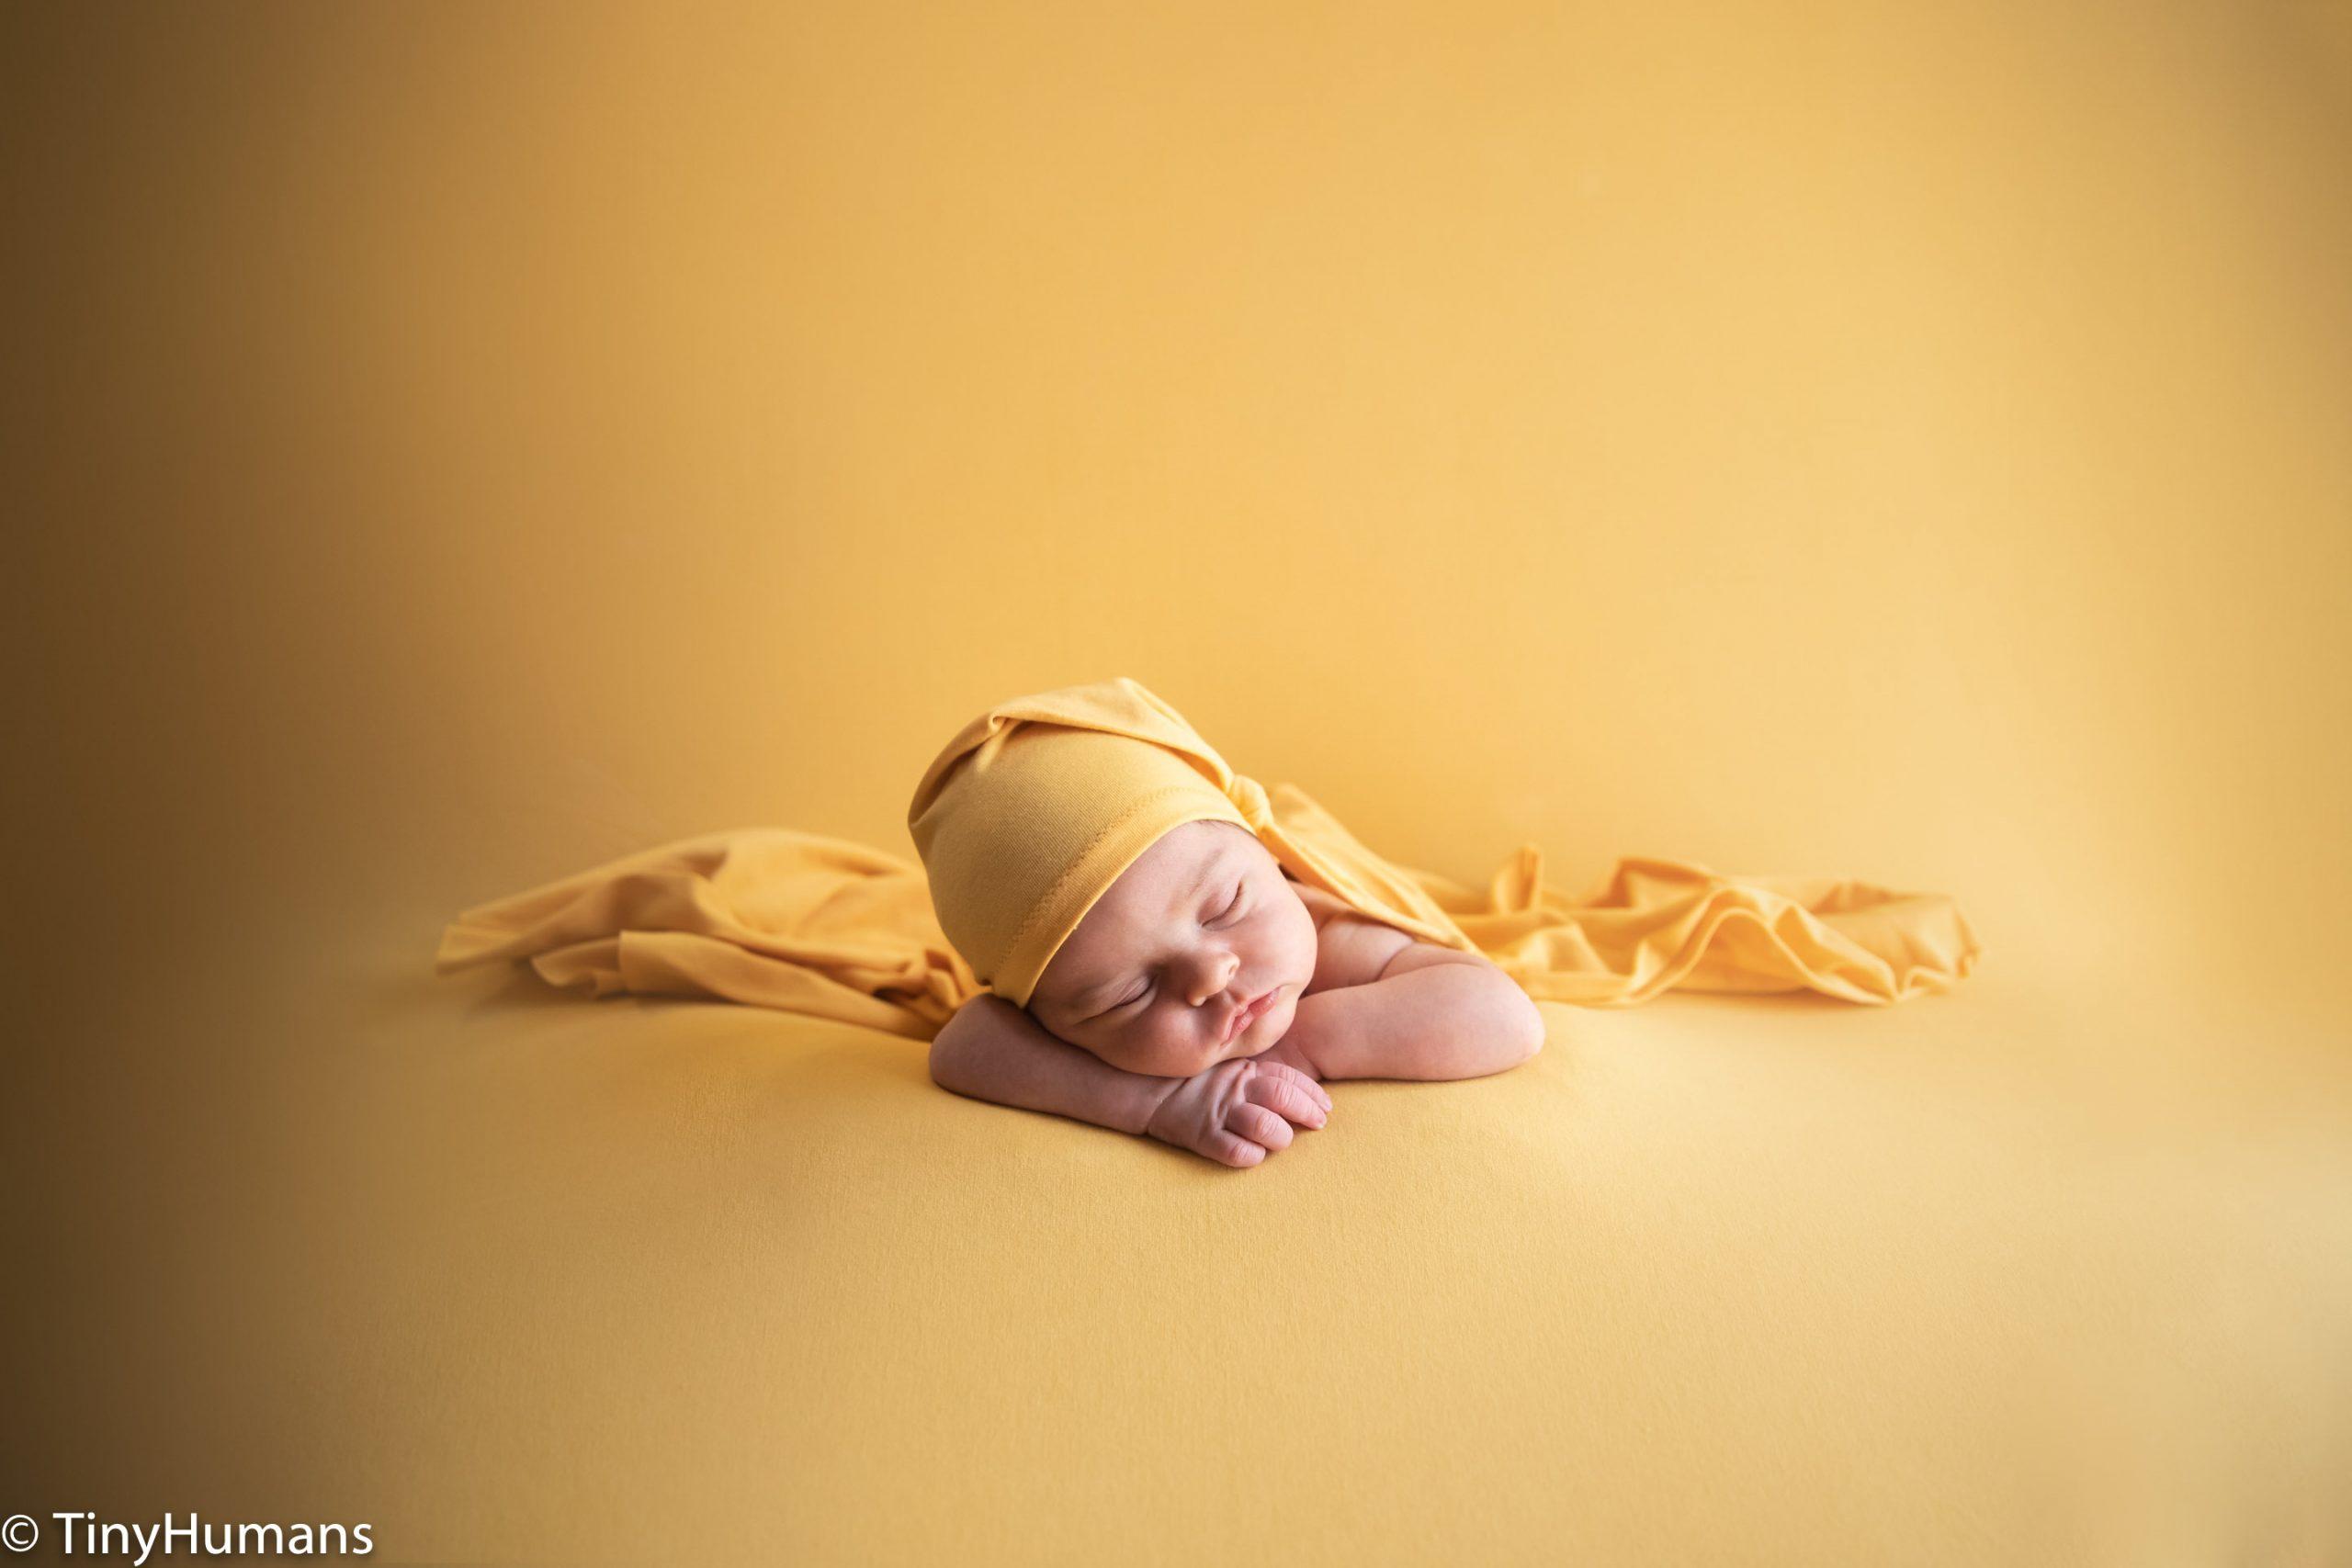 Newborn on yellow background